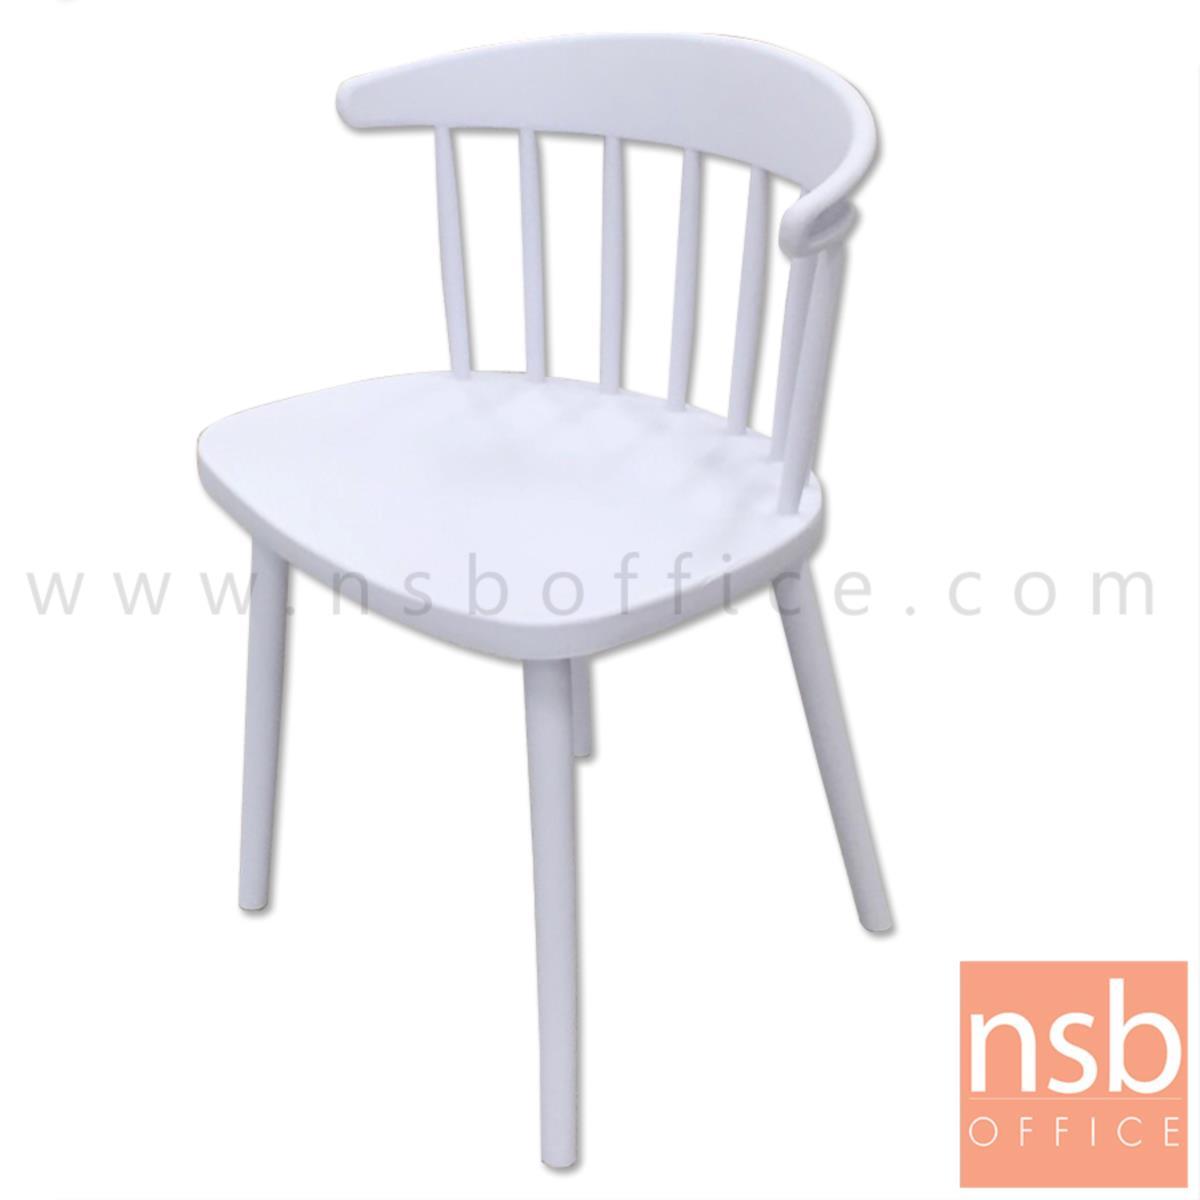 B29A314:เก้าอี้โมเดิร์นพลาสติกล้วน รุ่น Christie (คริสตี) ขนาด 51W cm. สีขาว